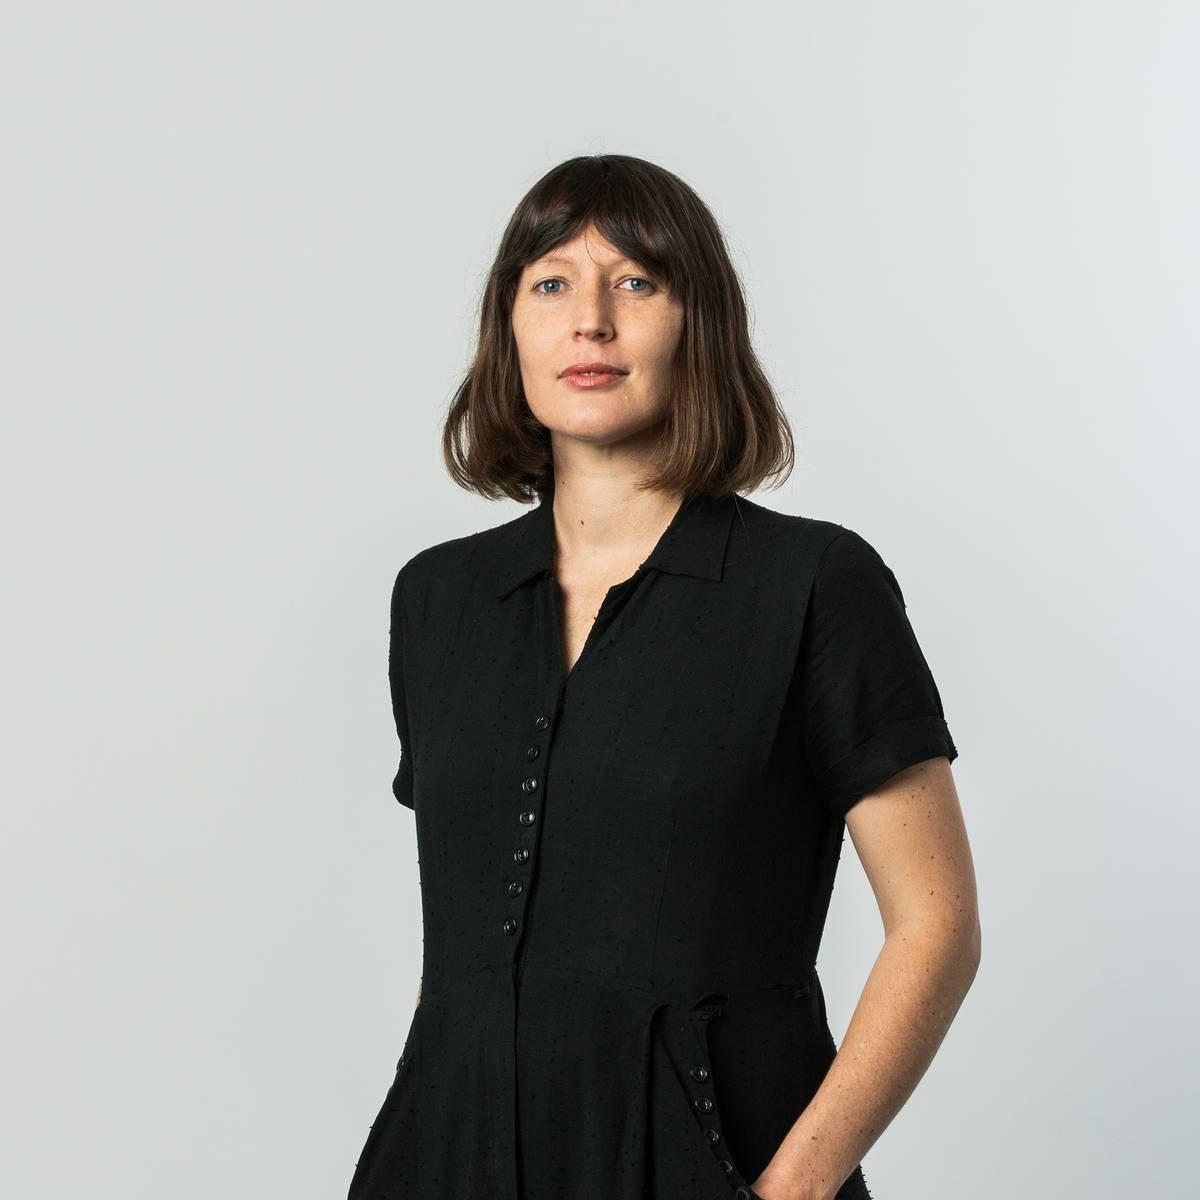 A profile image of Lizy Cretney